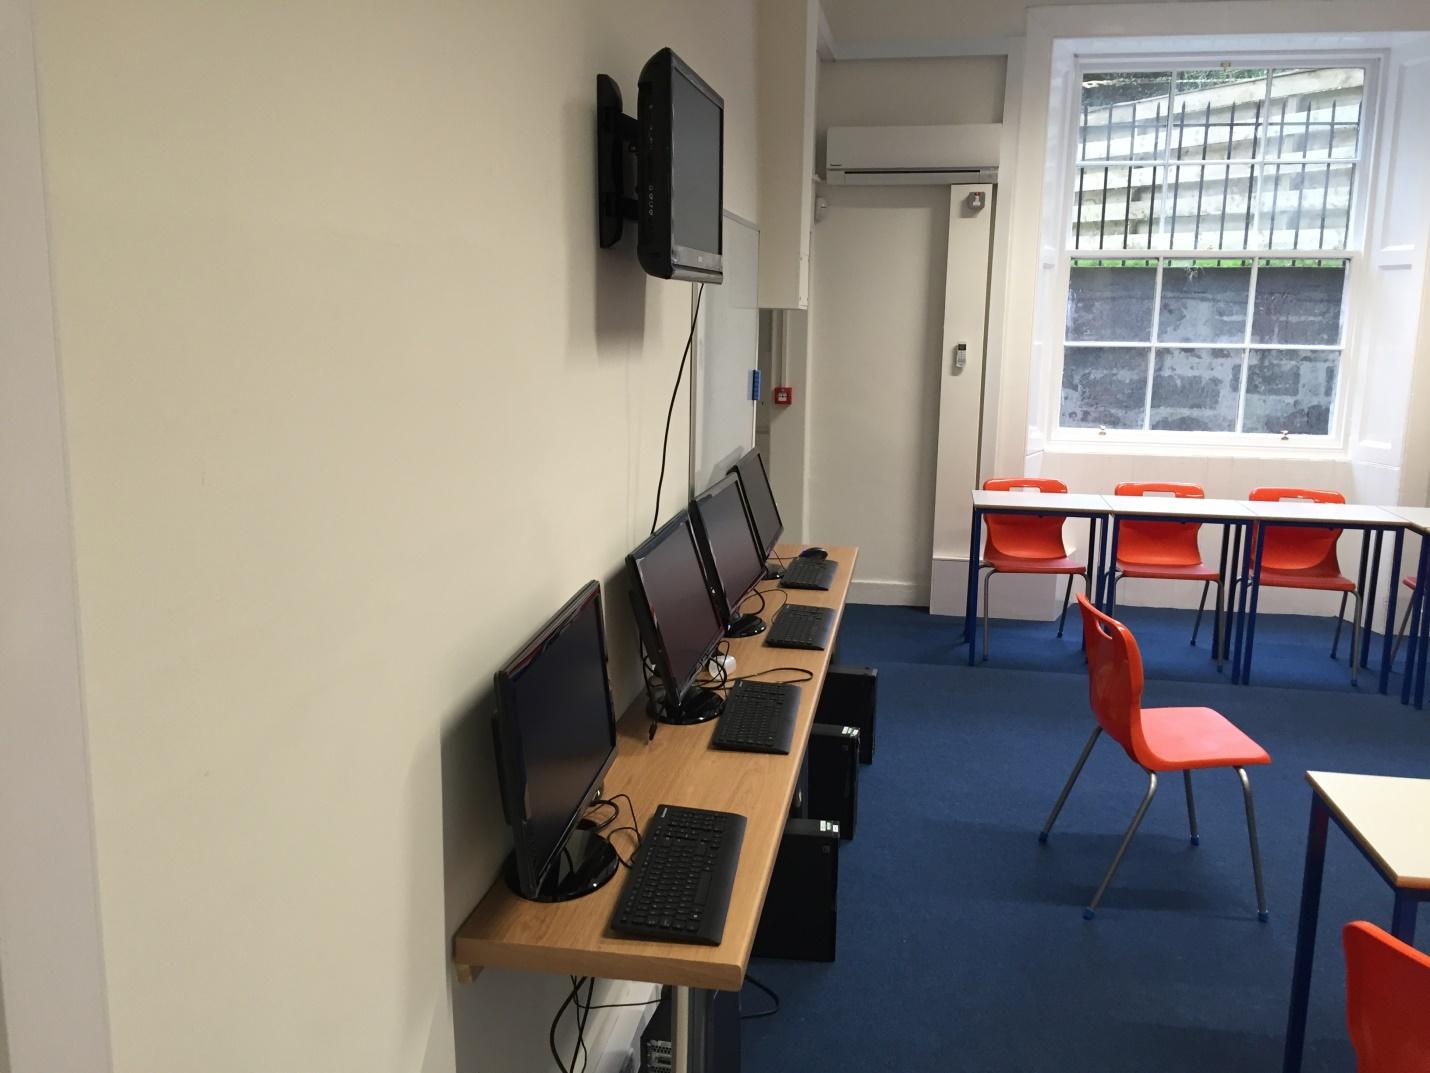 https://www.ces-schools.com/images/default-source/edinburgh-facilities/ces-edinburgh---computer-room.jpg?sfvrsn=17